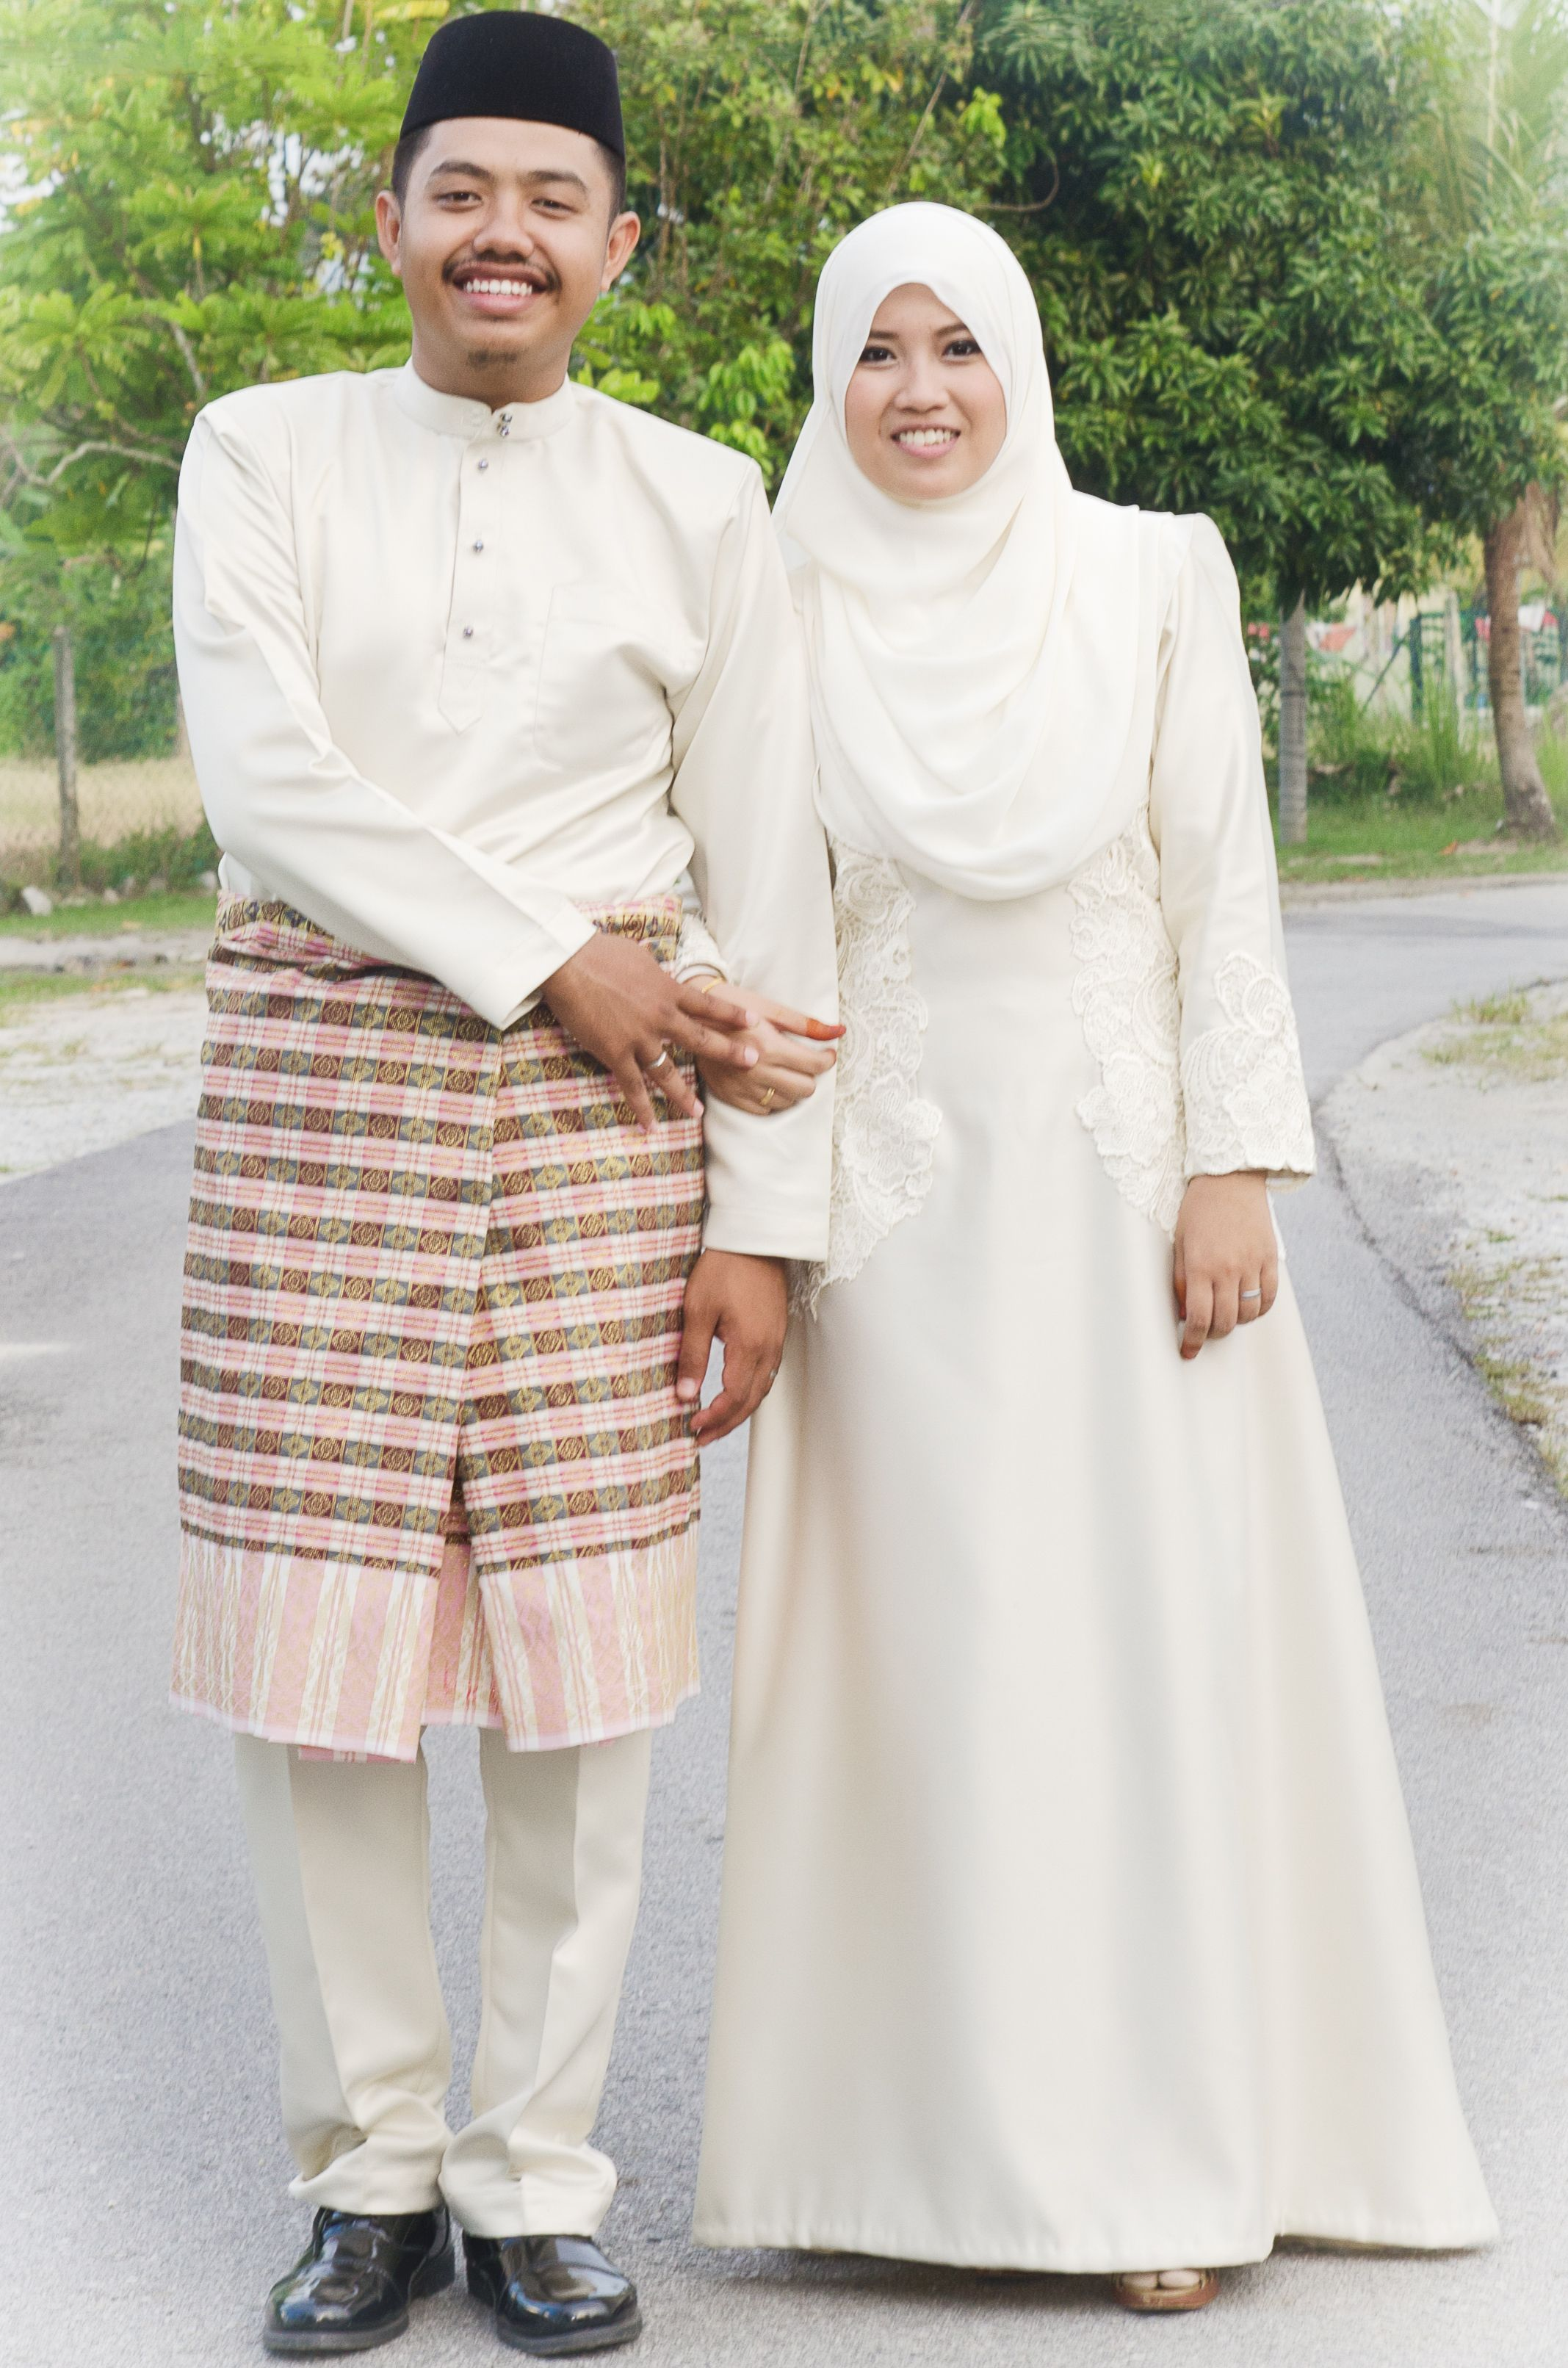 My Simple Solemnization Dress Pradalace Mycollection Muslim Wedding Dresses Wedding Dress Inspiration Bride Muslim [ 3224 x 2135 Pixel ]